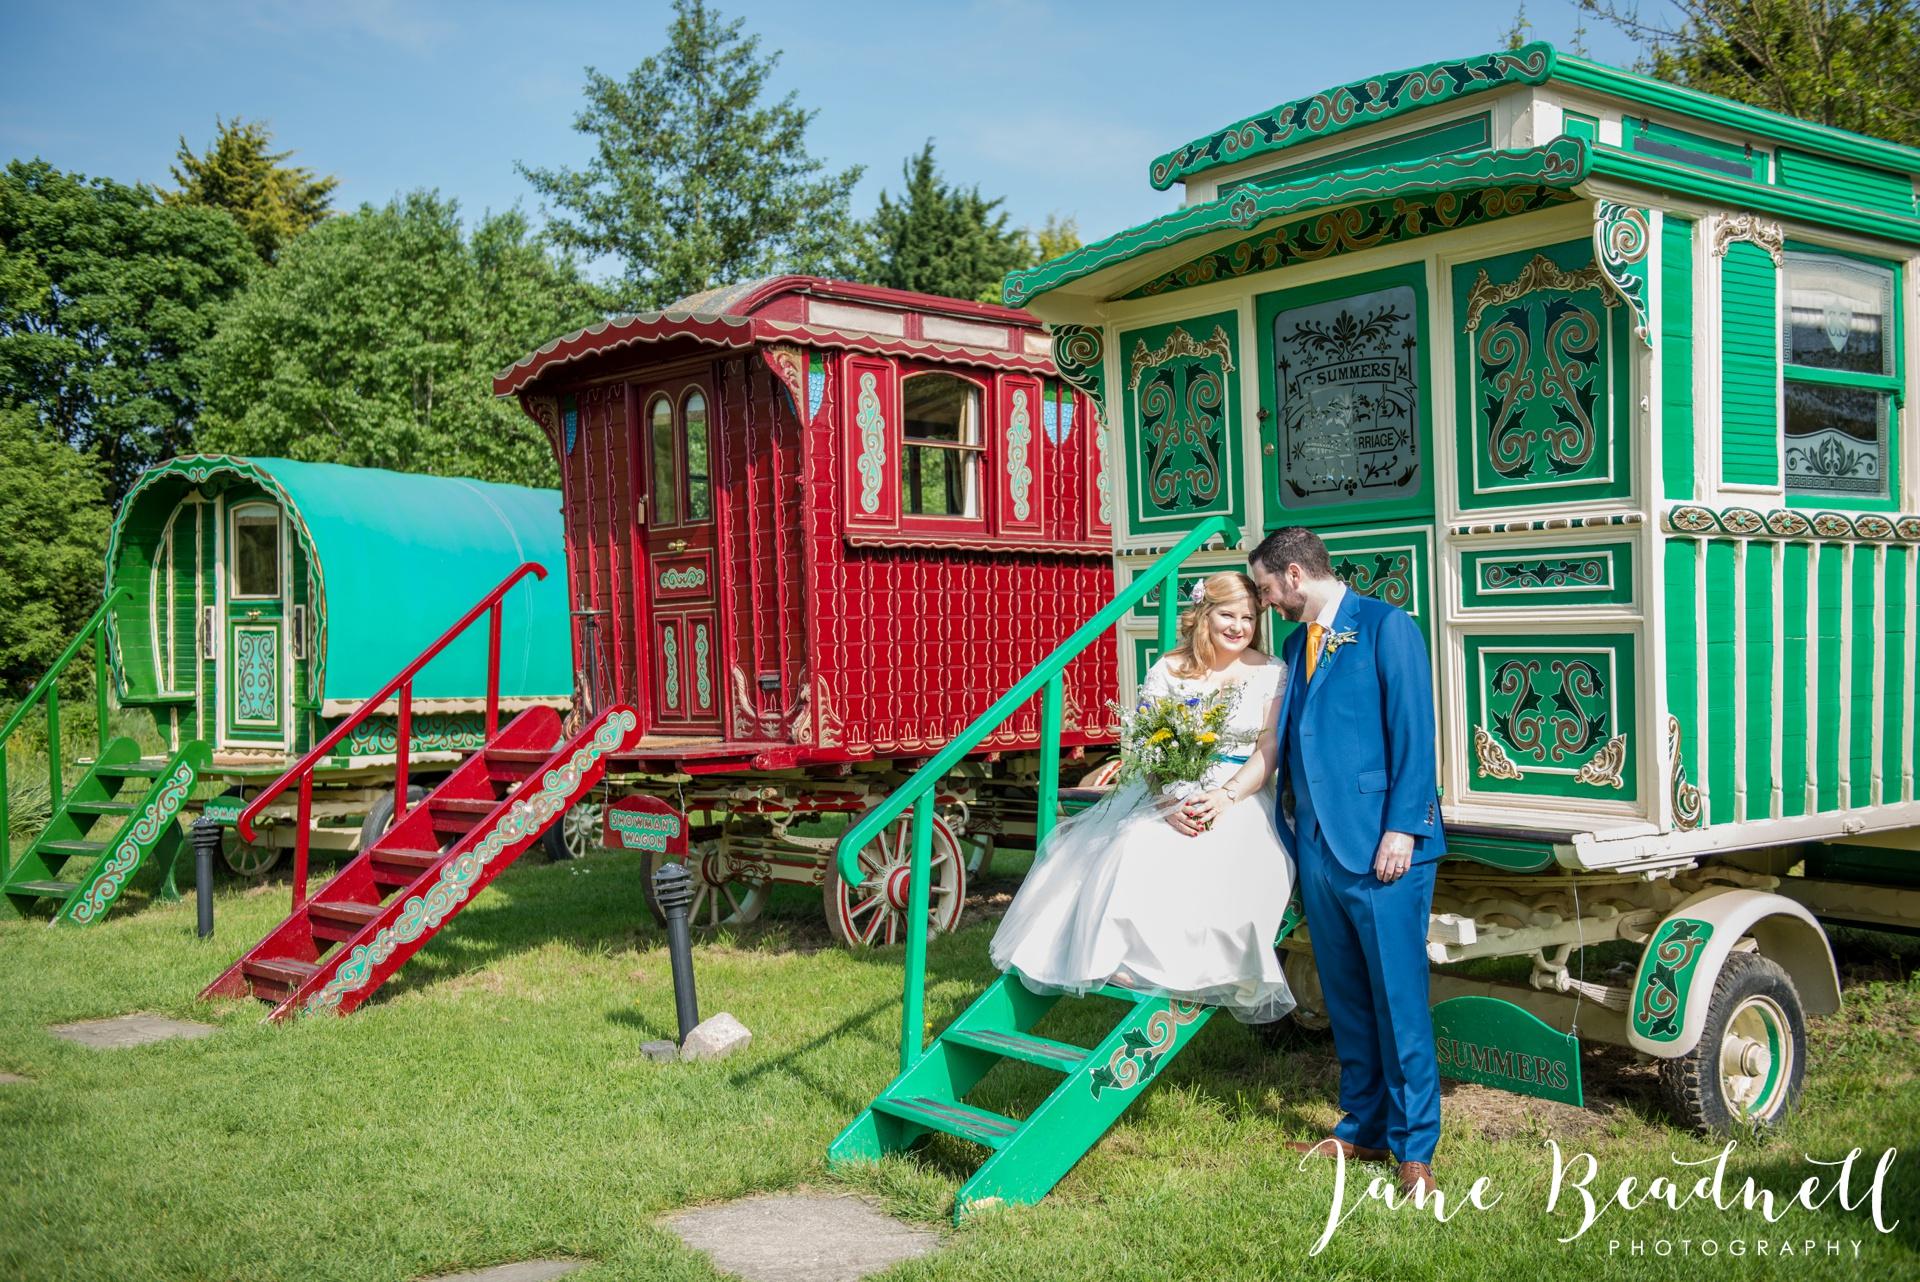 South Farm Wedding photography Hertfordshire by Jane Beadnell Photography fine art wedding photographer_0115